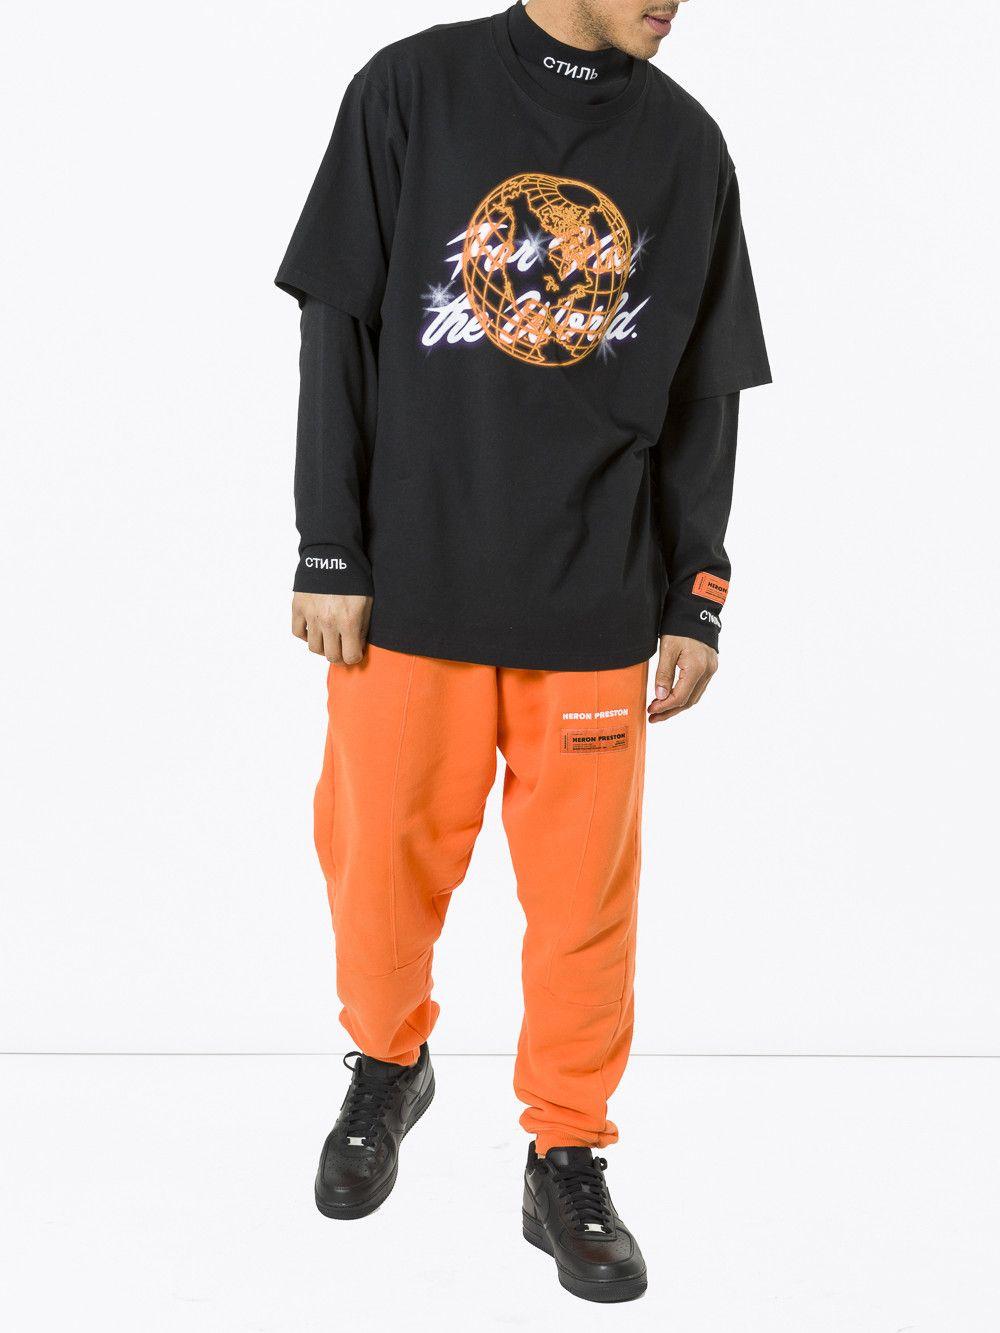 Nike AIR JORDAN 2019 SS Street Style Collaboration Long Sleeves Long Sleeve T Shirts